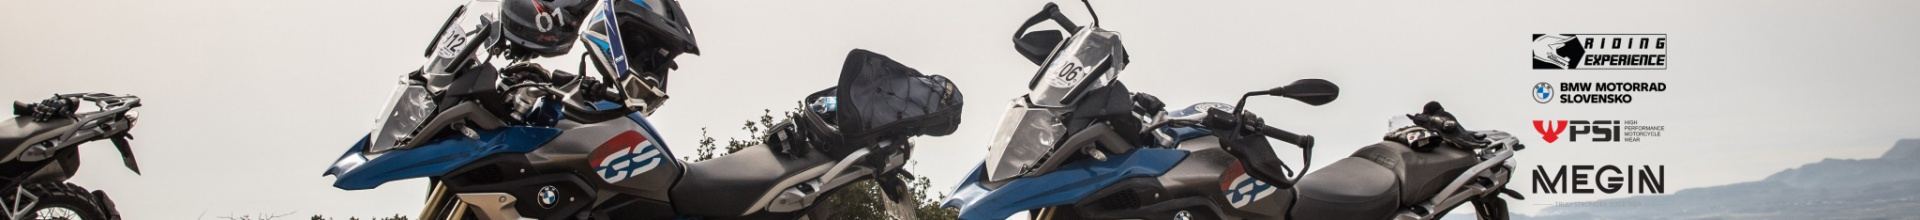 RMA Riding Experience - Spanien